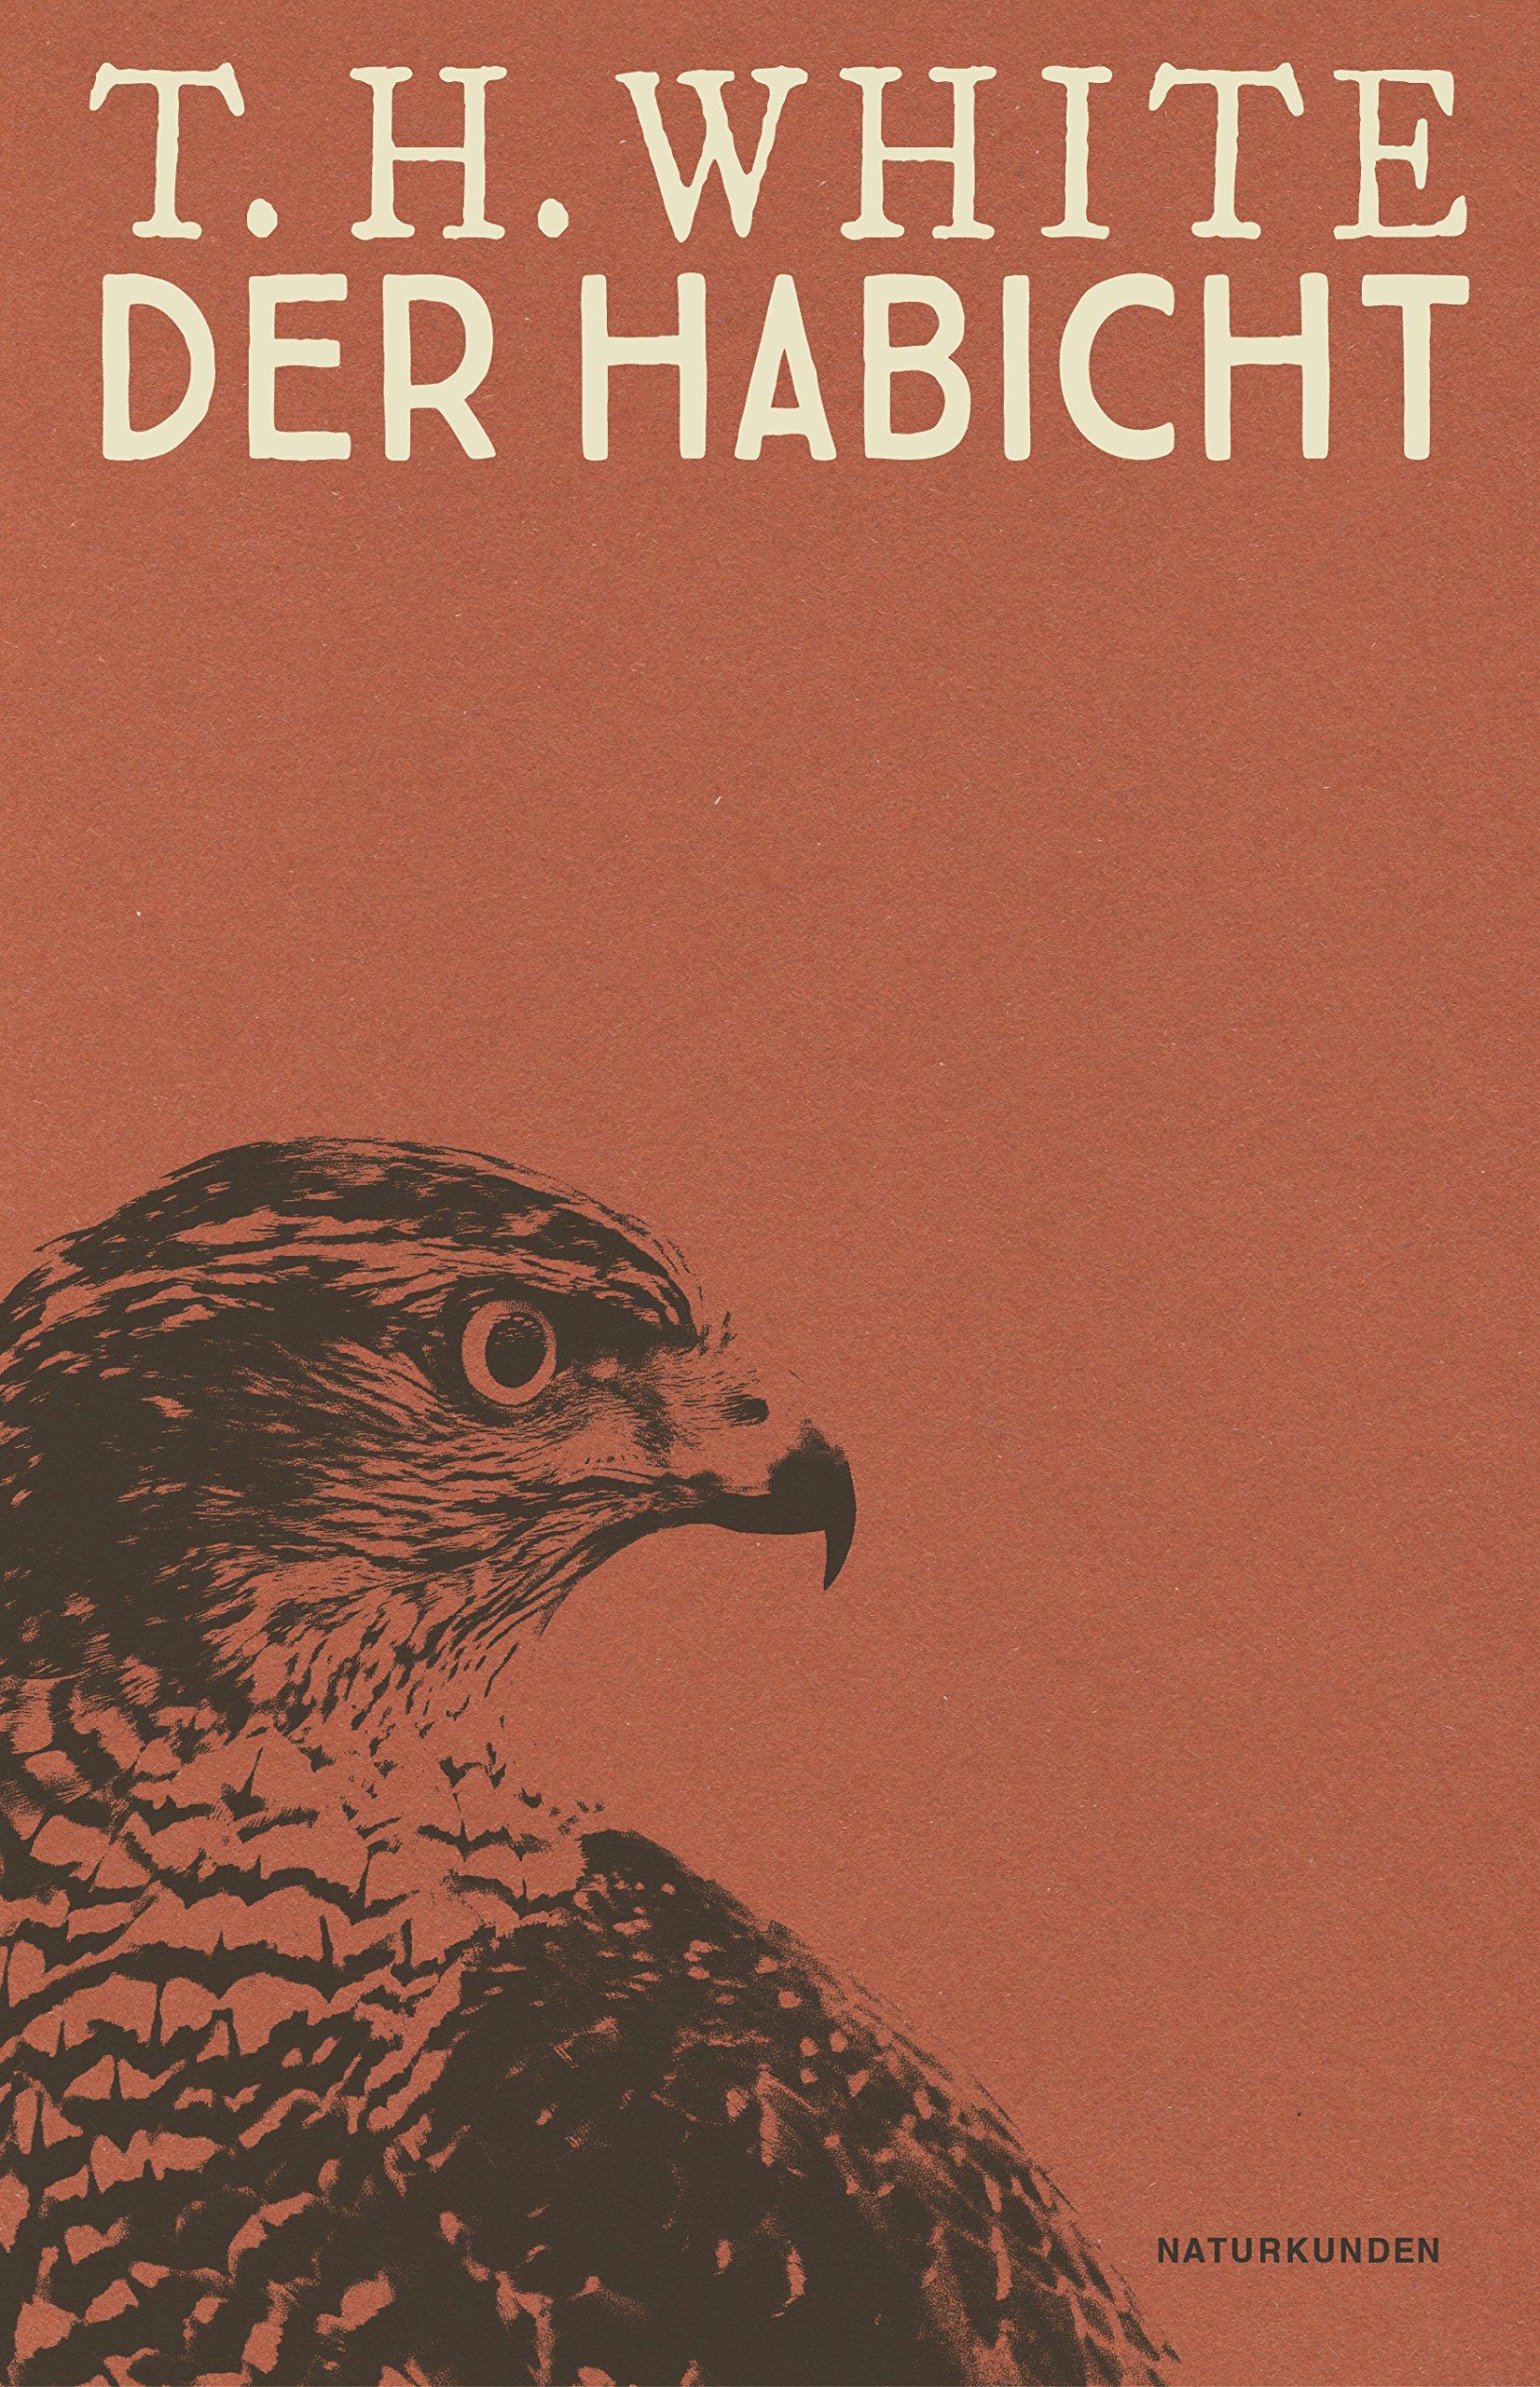 Der Habicht (Naturkunden) Gebundenes Buch – 30. November 2018 Judith Schalansky Terence Hanbury White Helen Macdonald Cord Riechelmann